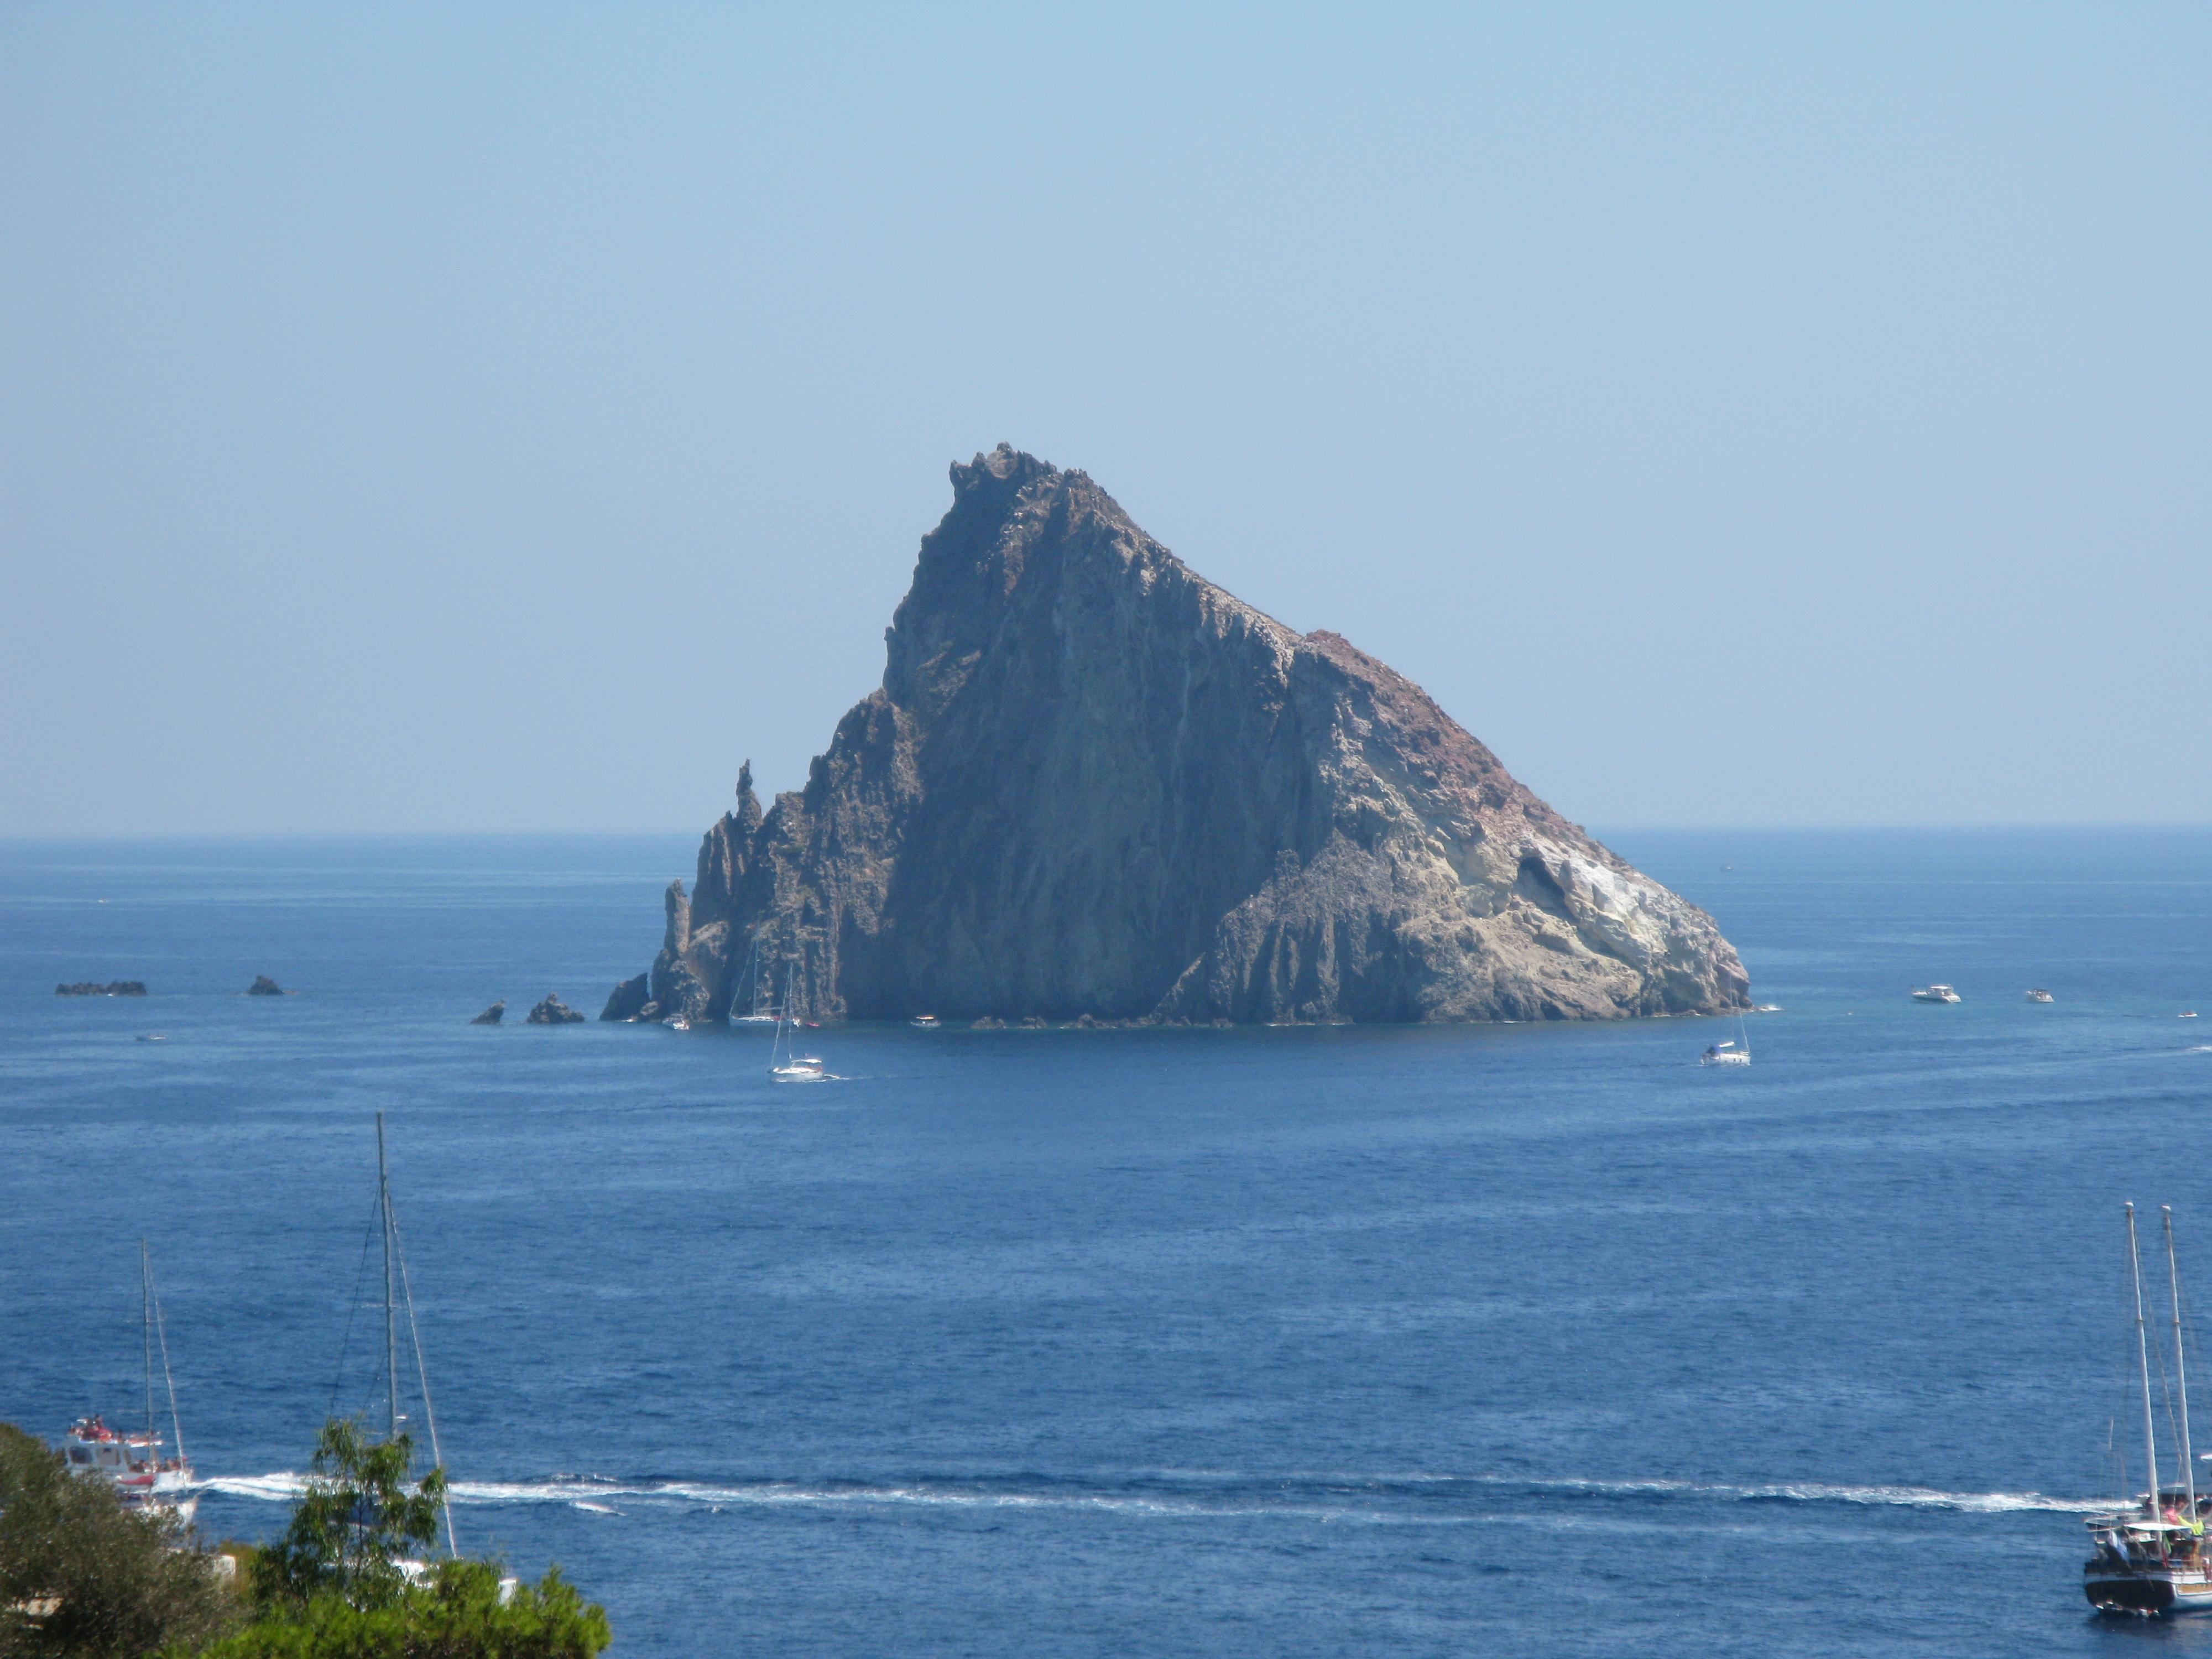 Noleggio Barche Dattilo - Navalia | Noleggia un Sogno